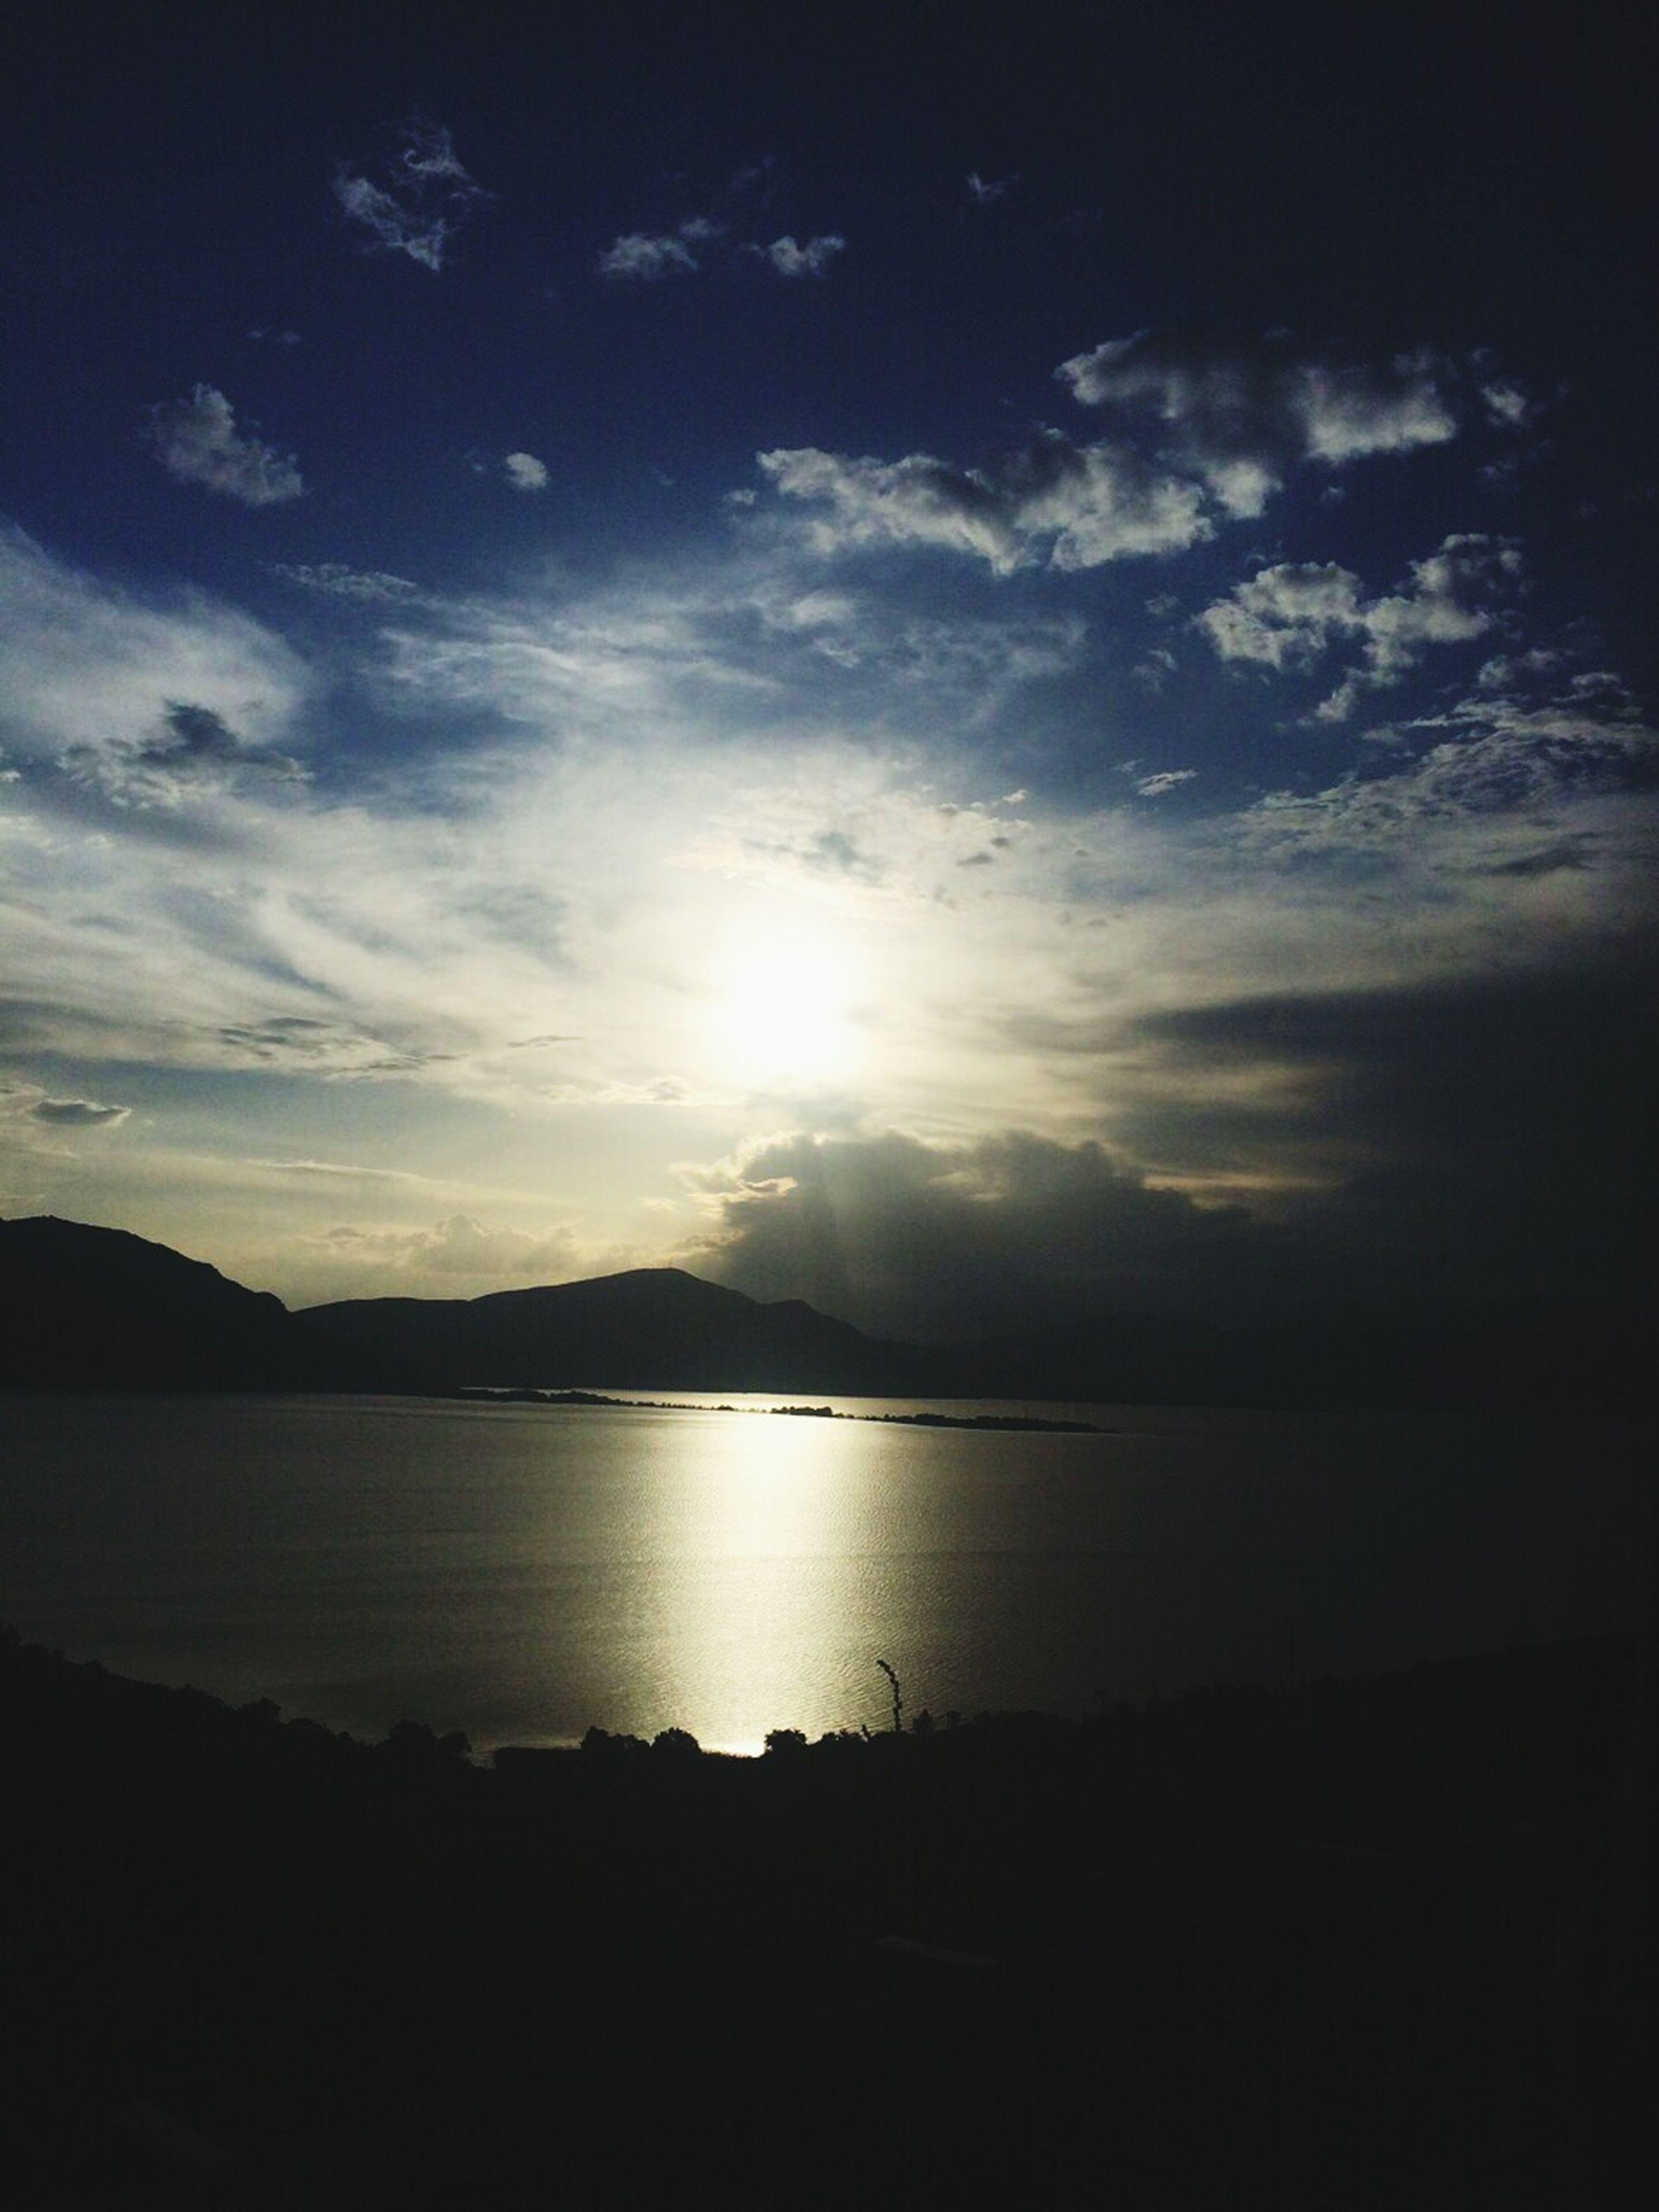 tranquil scene, scenics, water, sky, tranquility, beauty in nature, sun, silhouette, sunset, cloud - sky, sea, nature, reflection, idyllic, sunlight, sunbeam, beach, mountain, cloud, lake